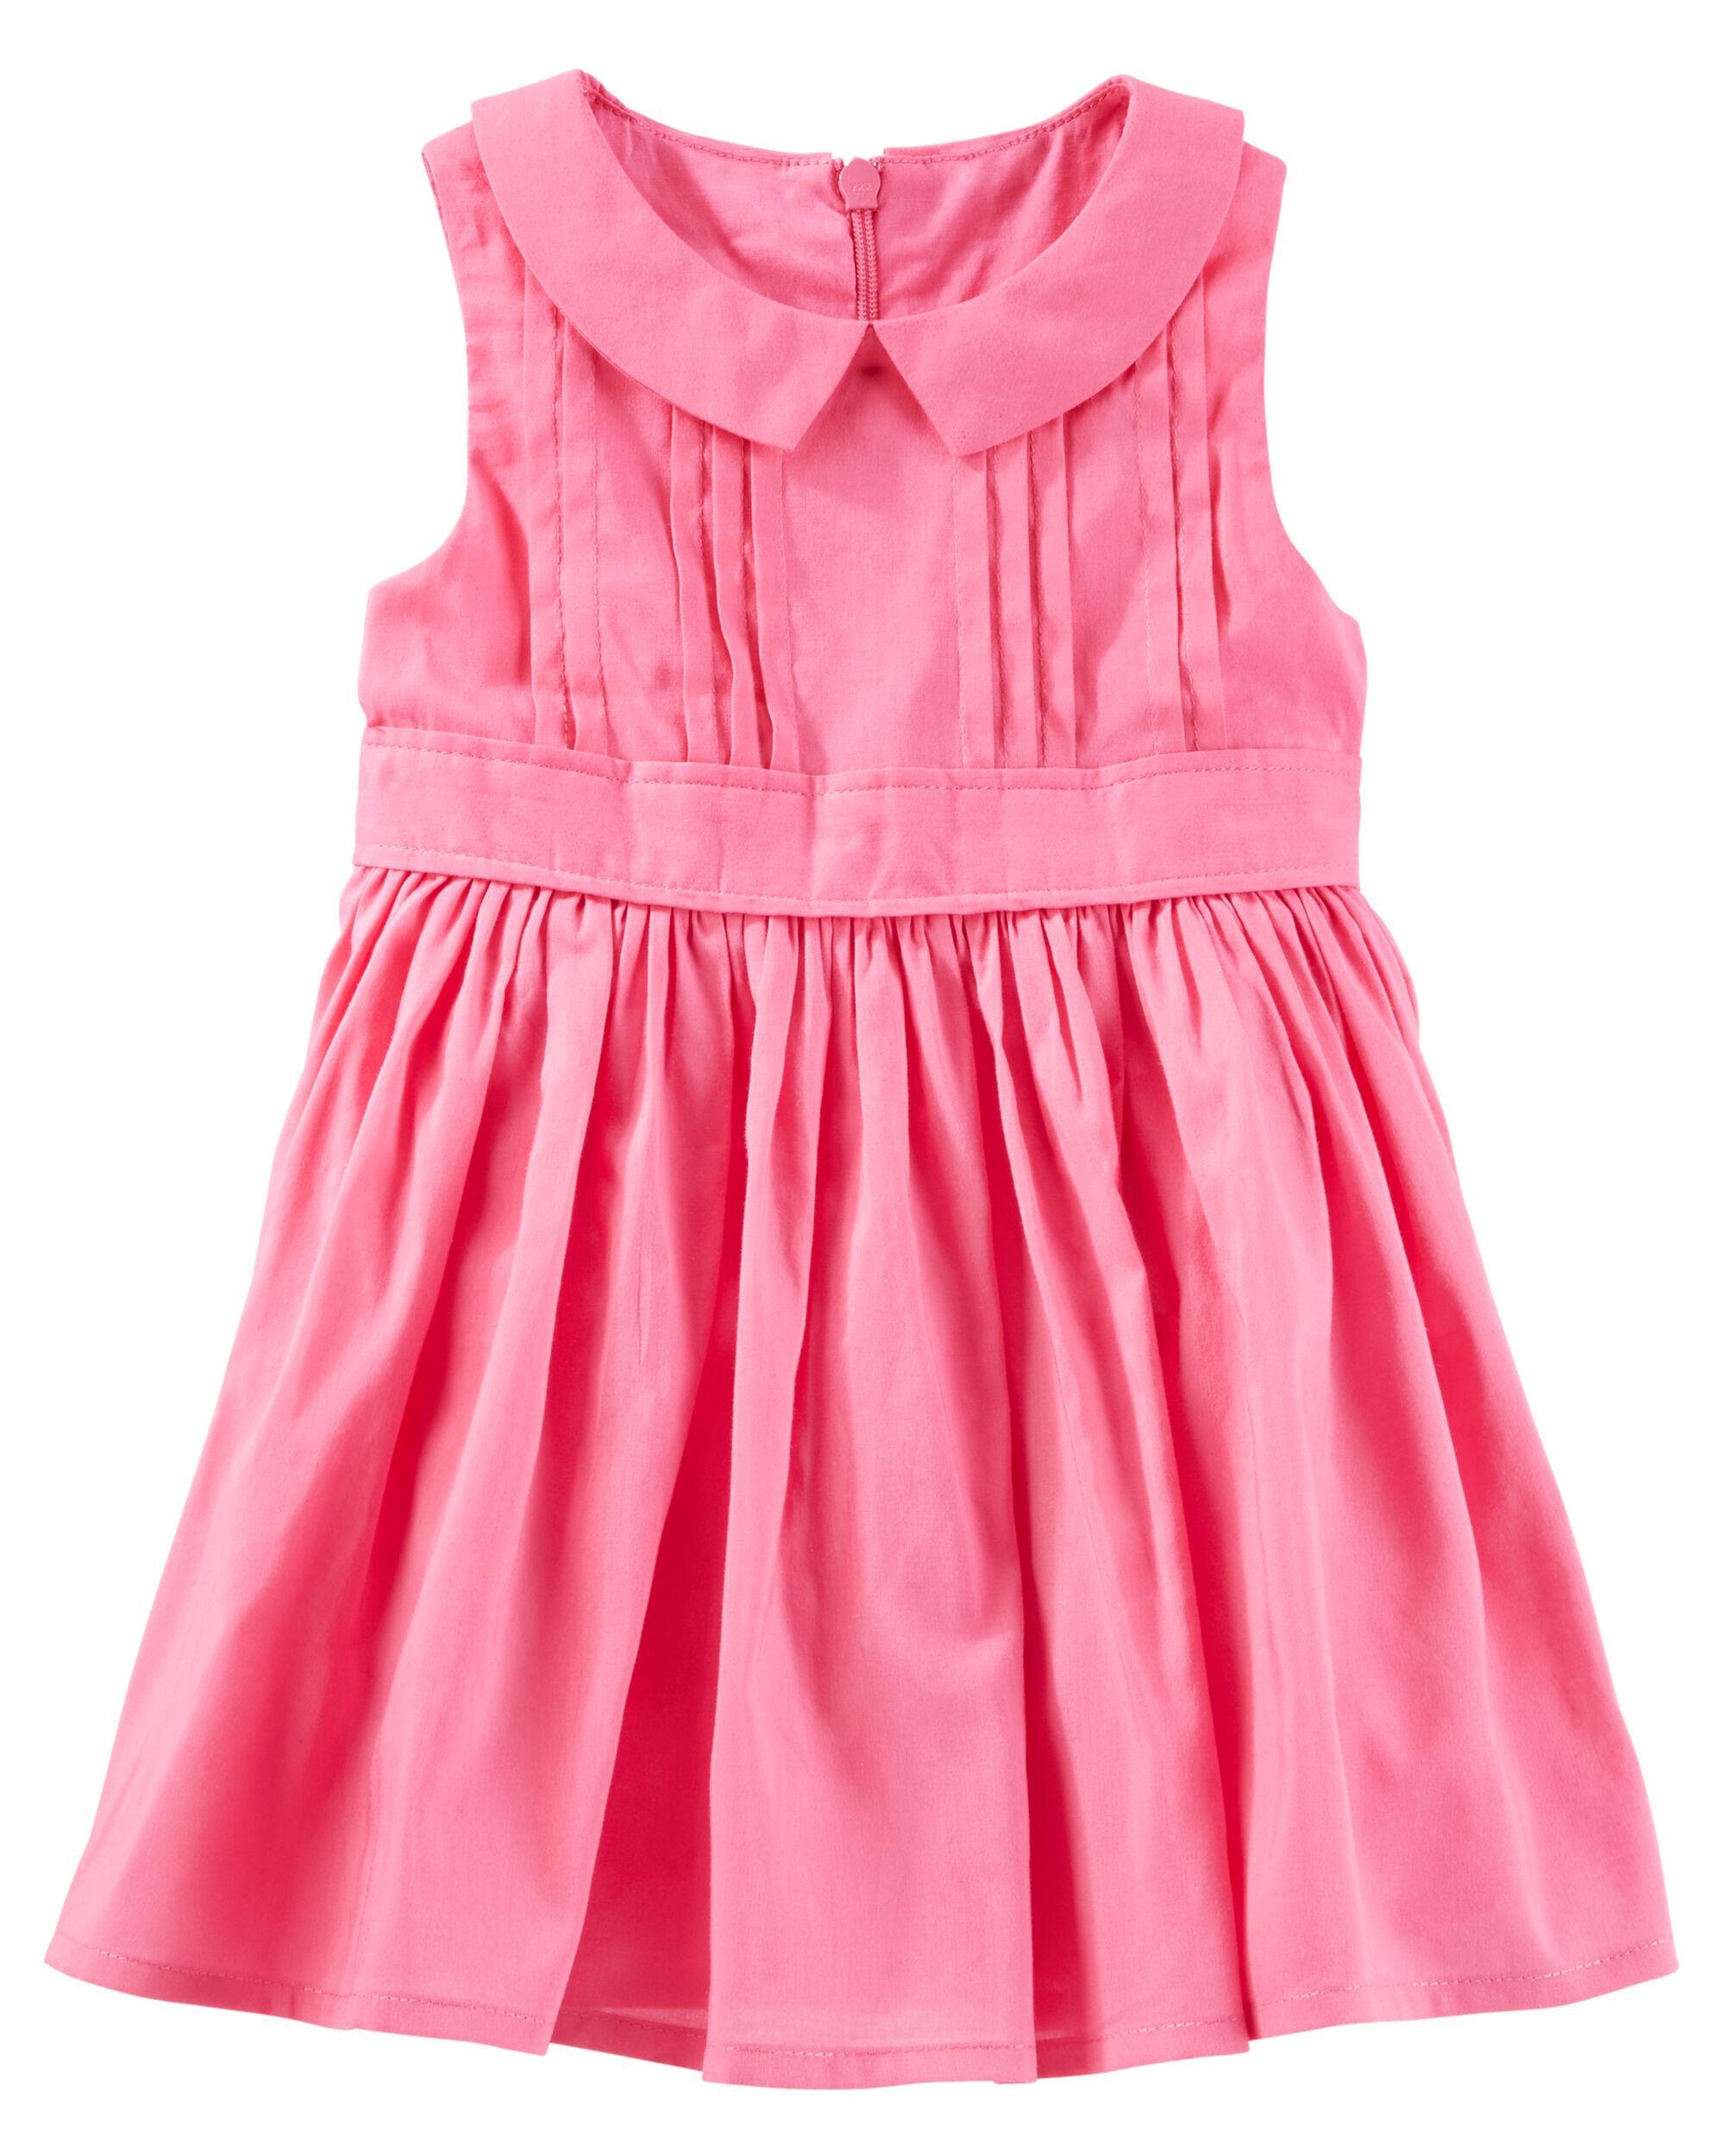 Baby Girl 2 Piece Pleated Peter Pan Collar Dress